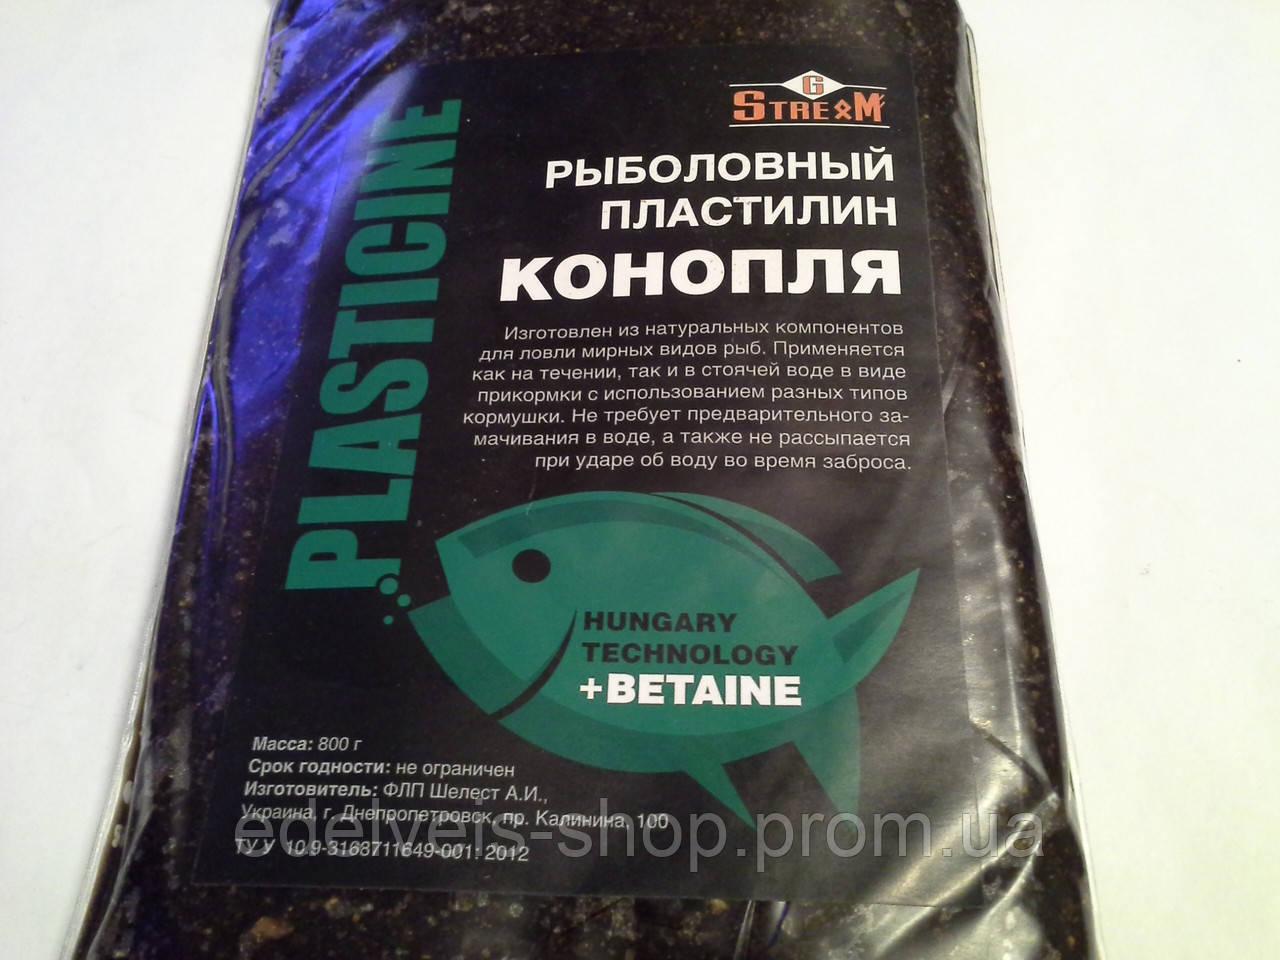 Пластилин рыболовный G.STREAM Конопля с бетаином